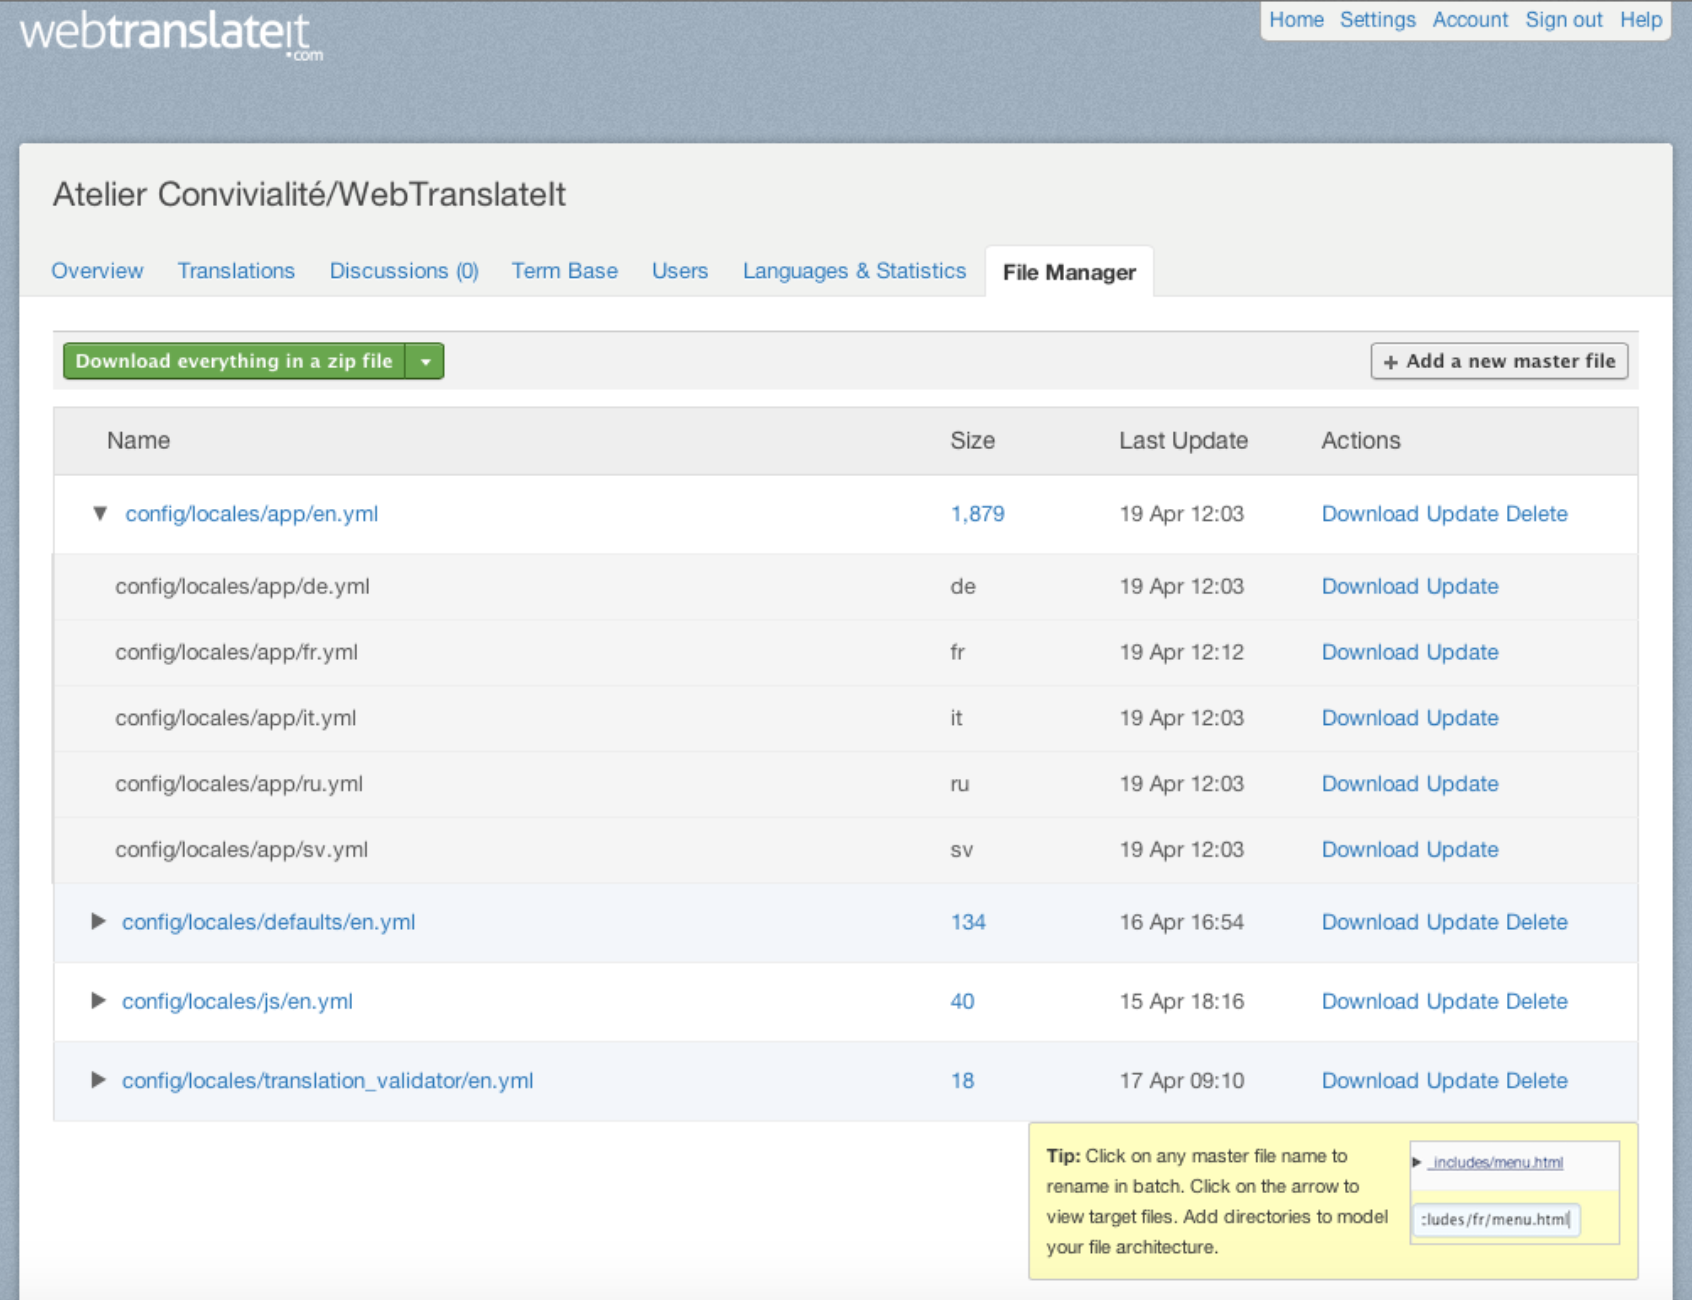 webtranslateit.com Demo - Your File Manager